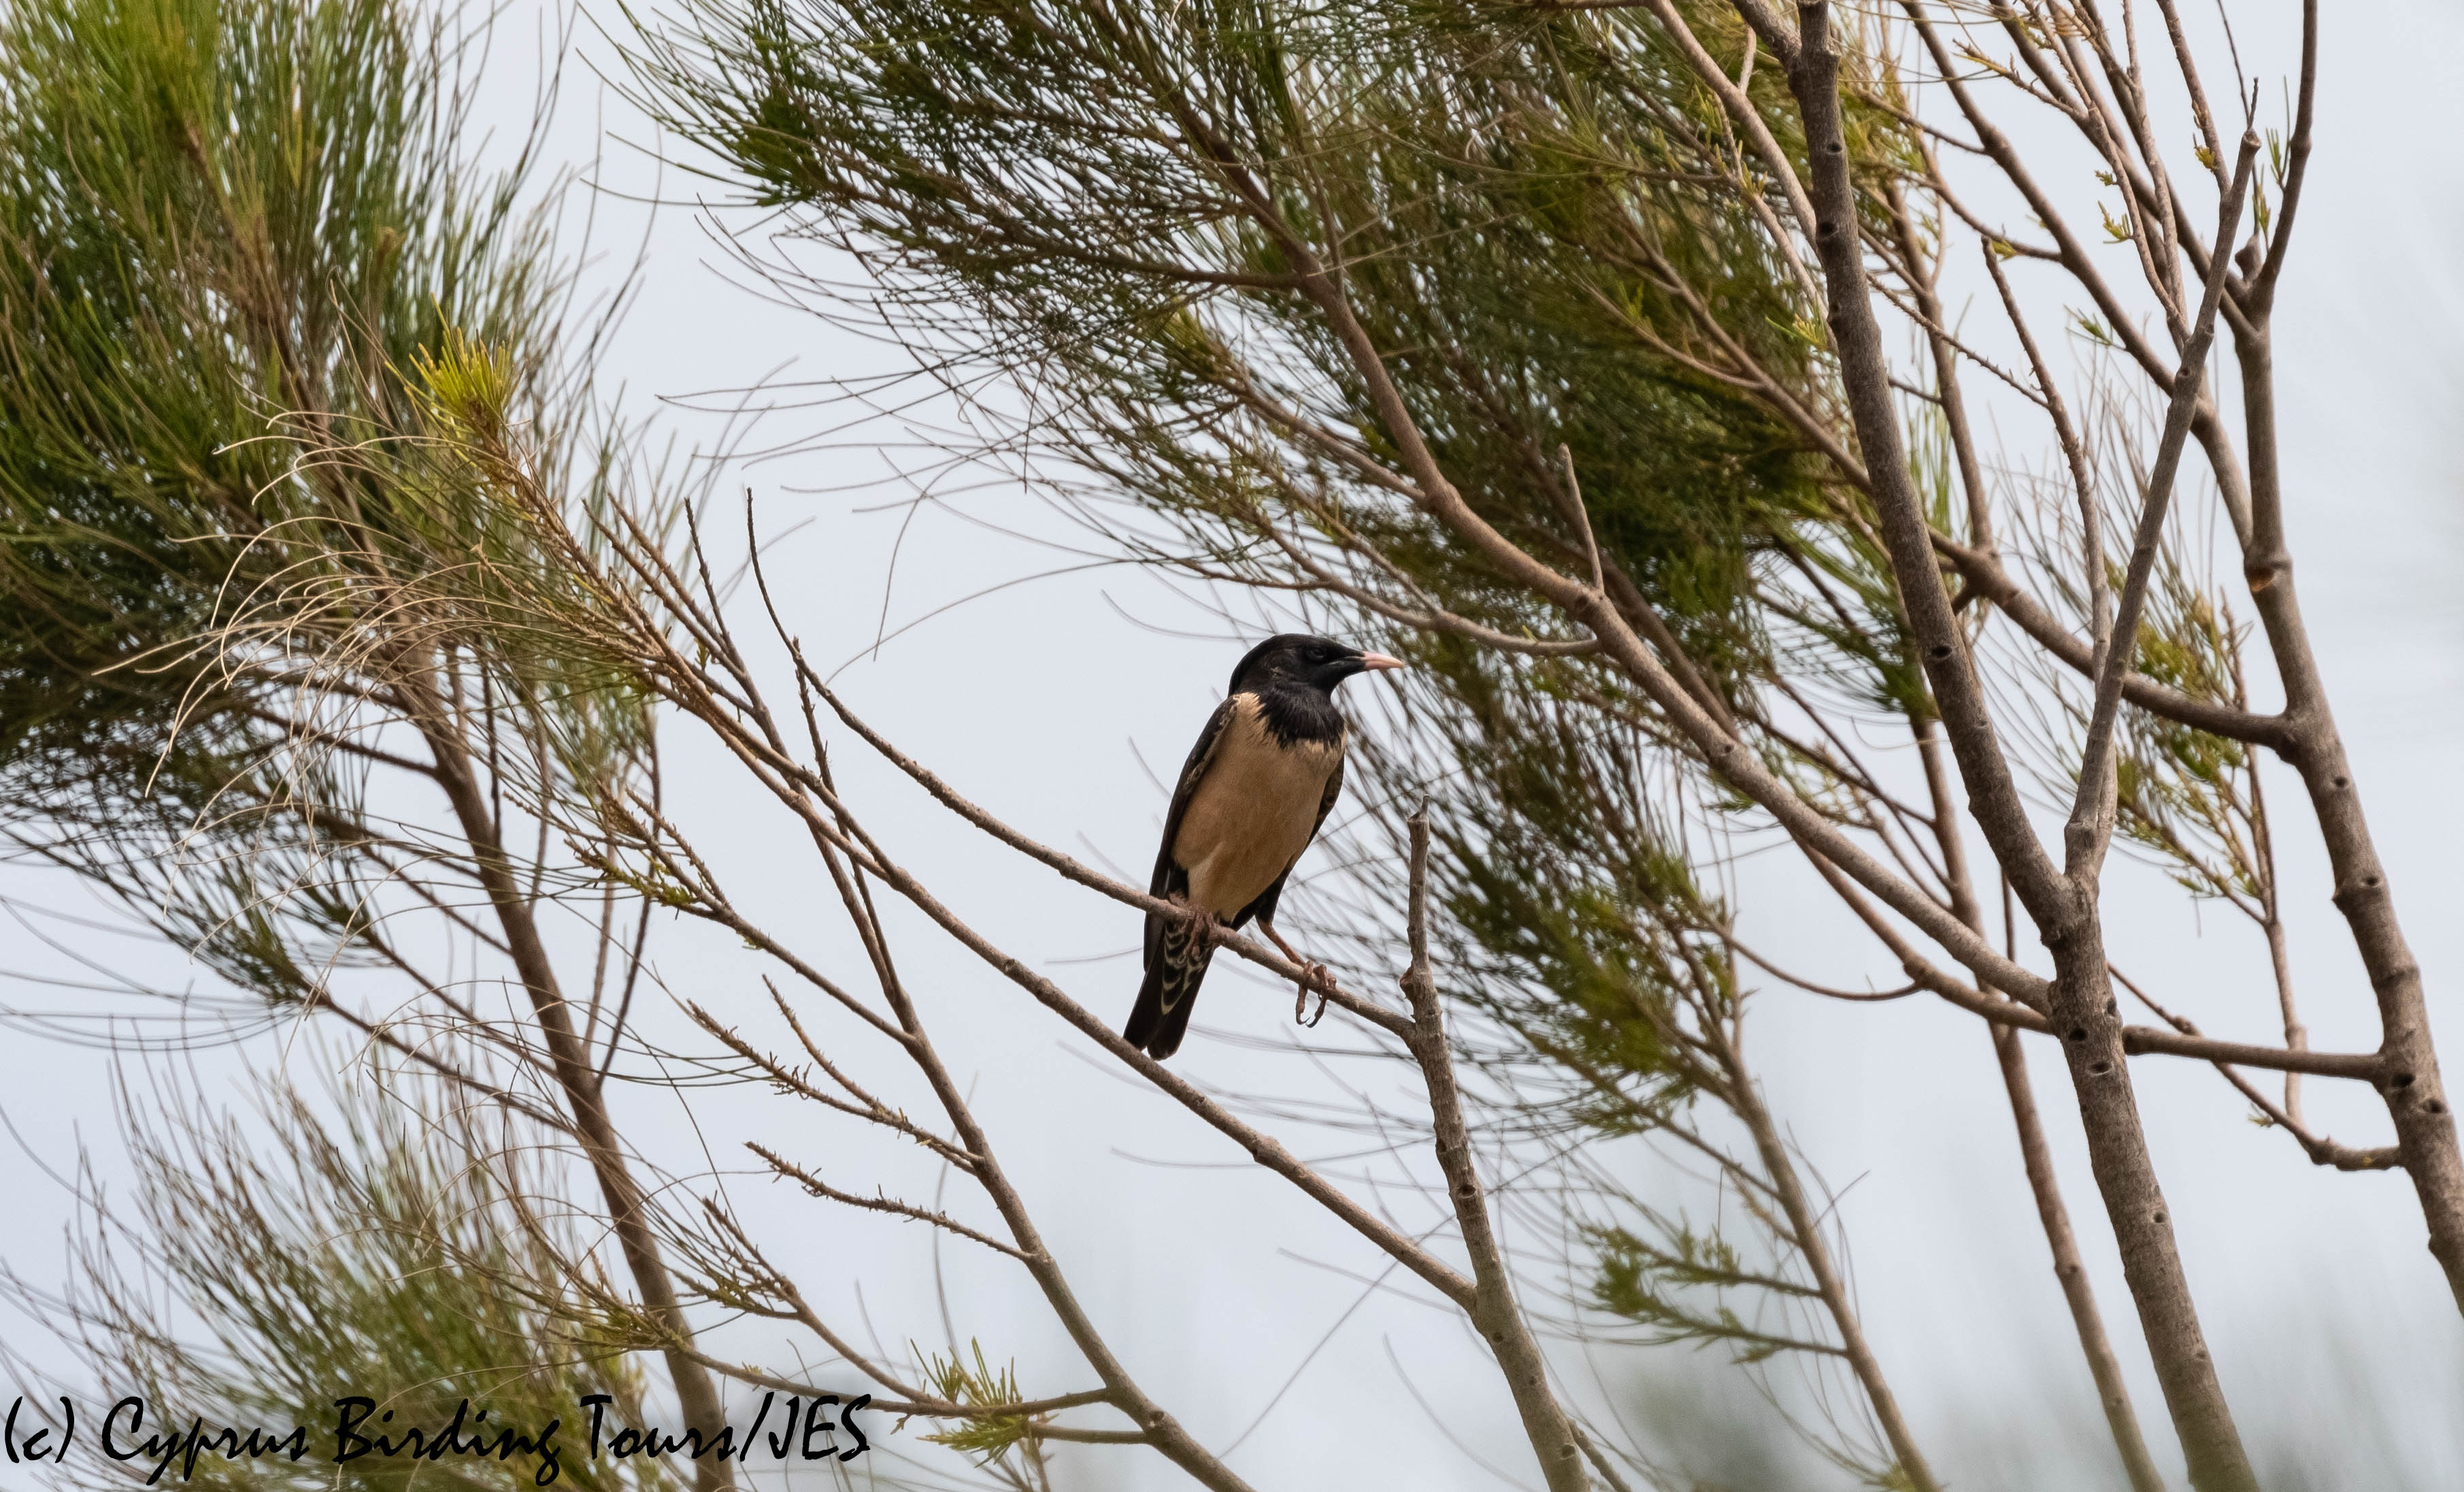 Rose-coloured Starling, Akrotiri 24th May 2019 (c) Cyprus Birding Tours